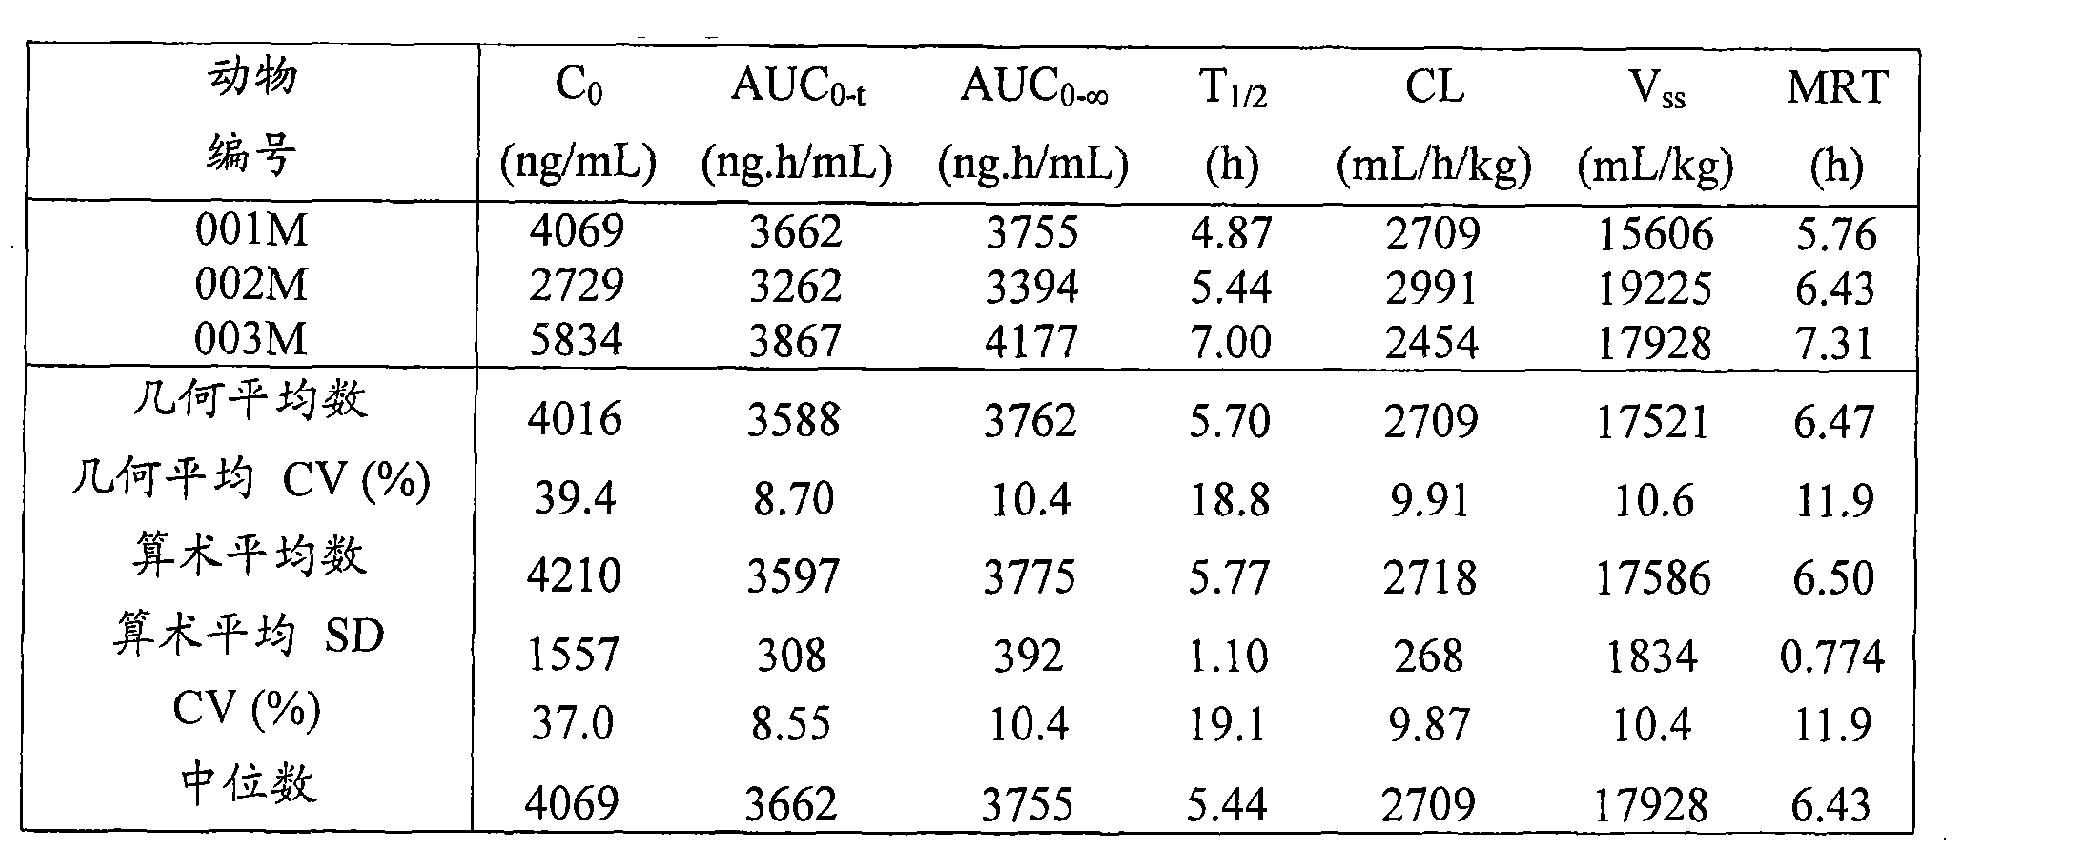 CN101466669B - Phenyl pyrrole aminoguanidine derivatives